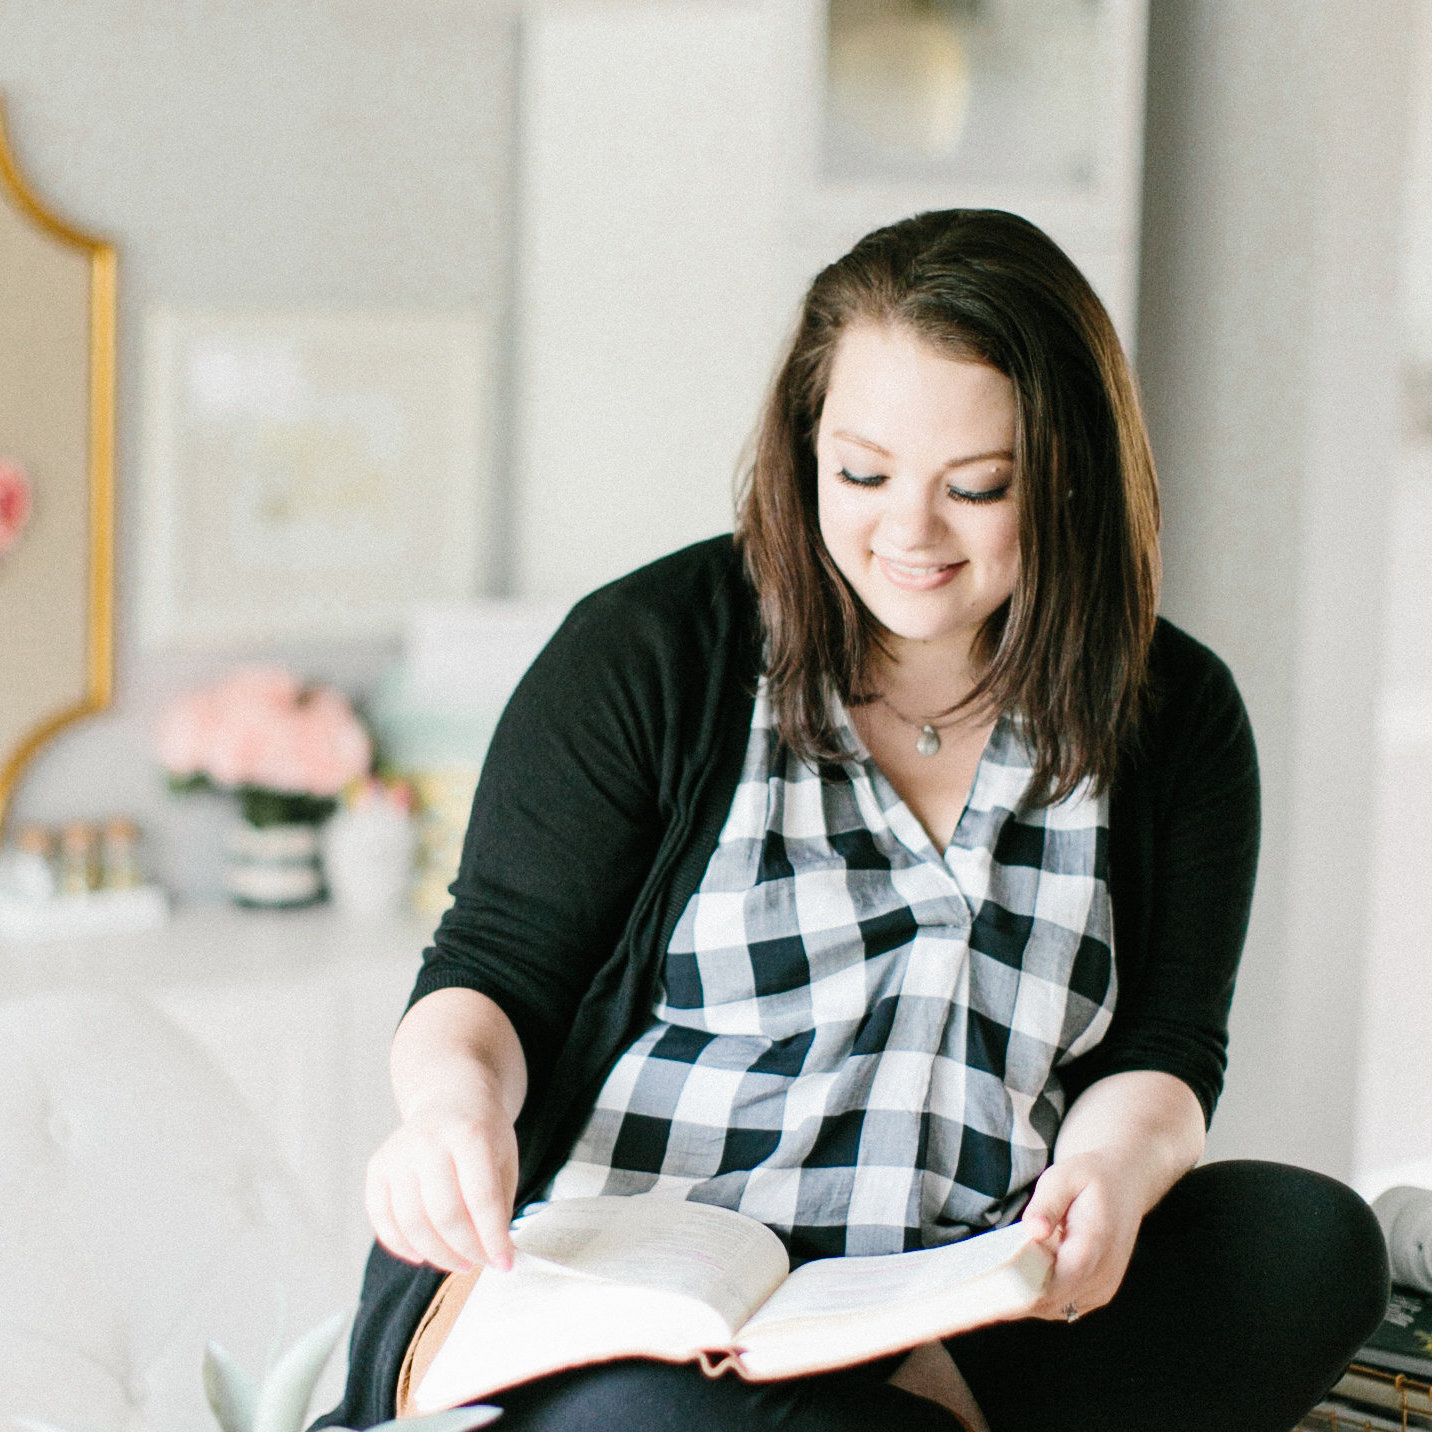 ep. 36 | Biblical Literacy for Women with Kristin Schmucker -